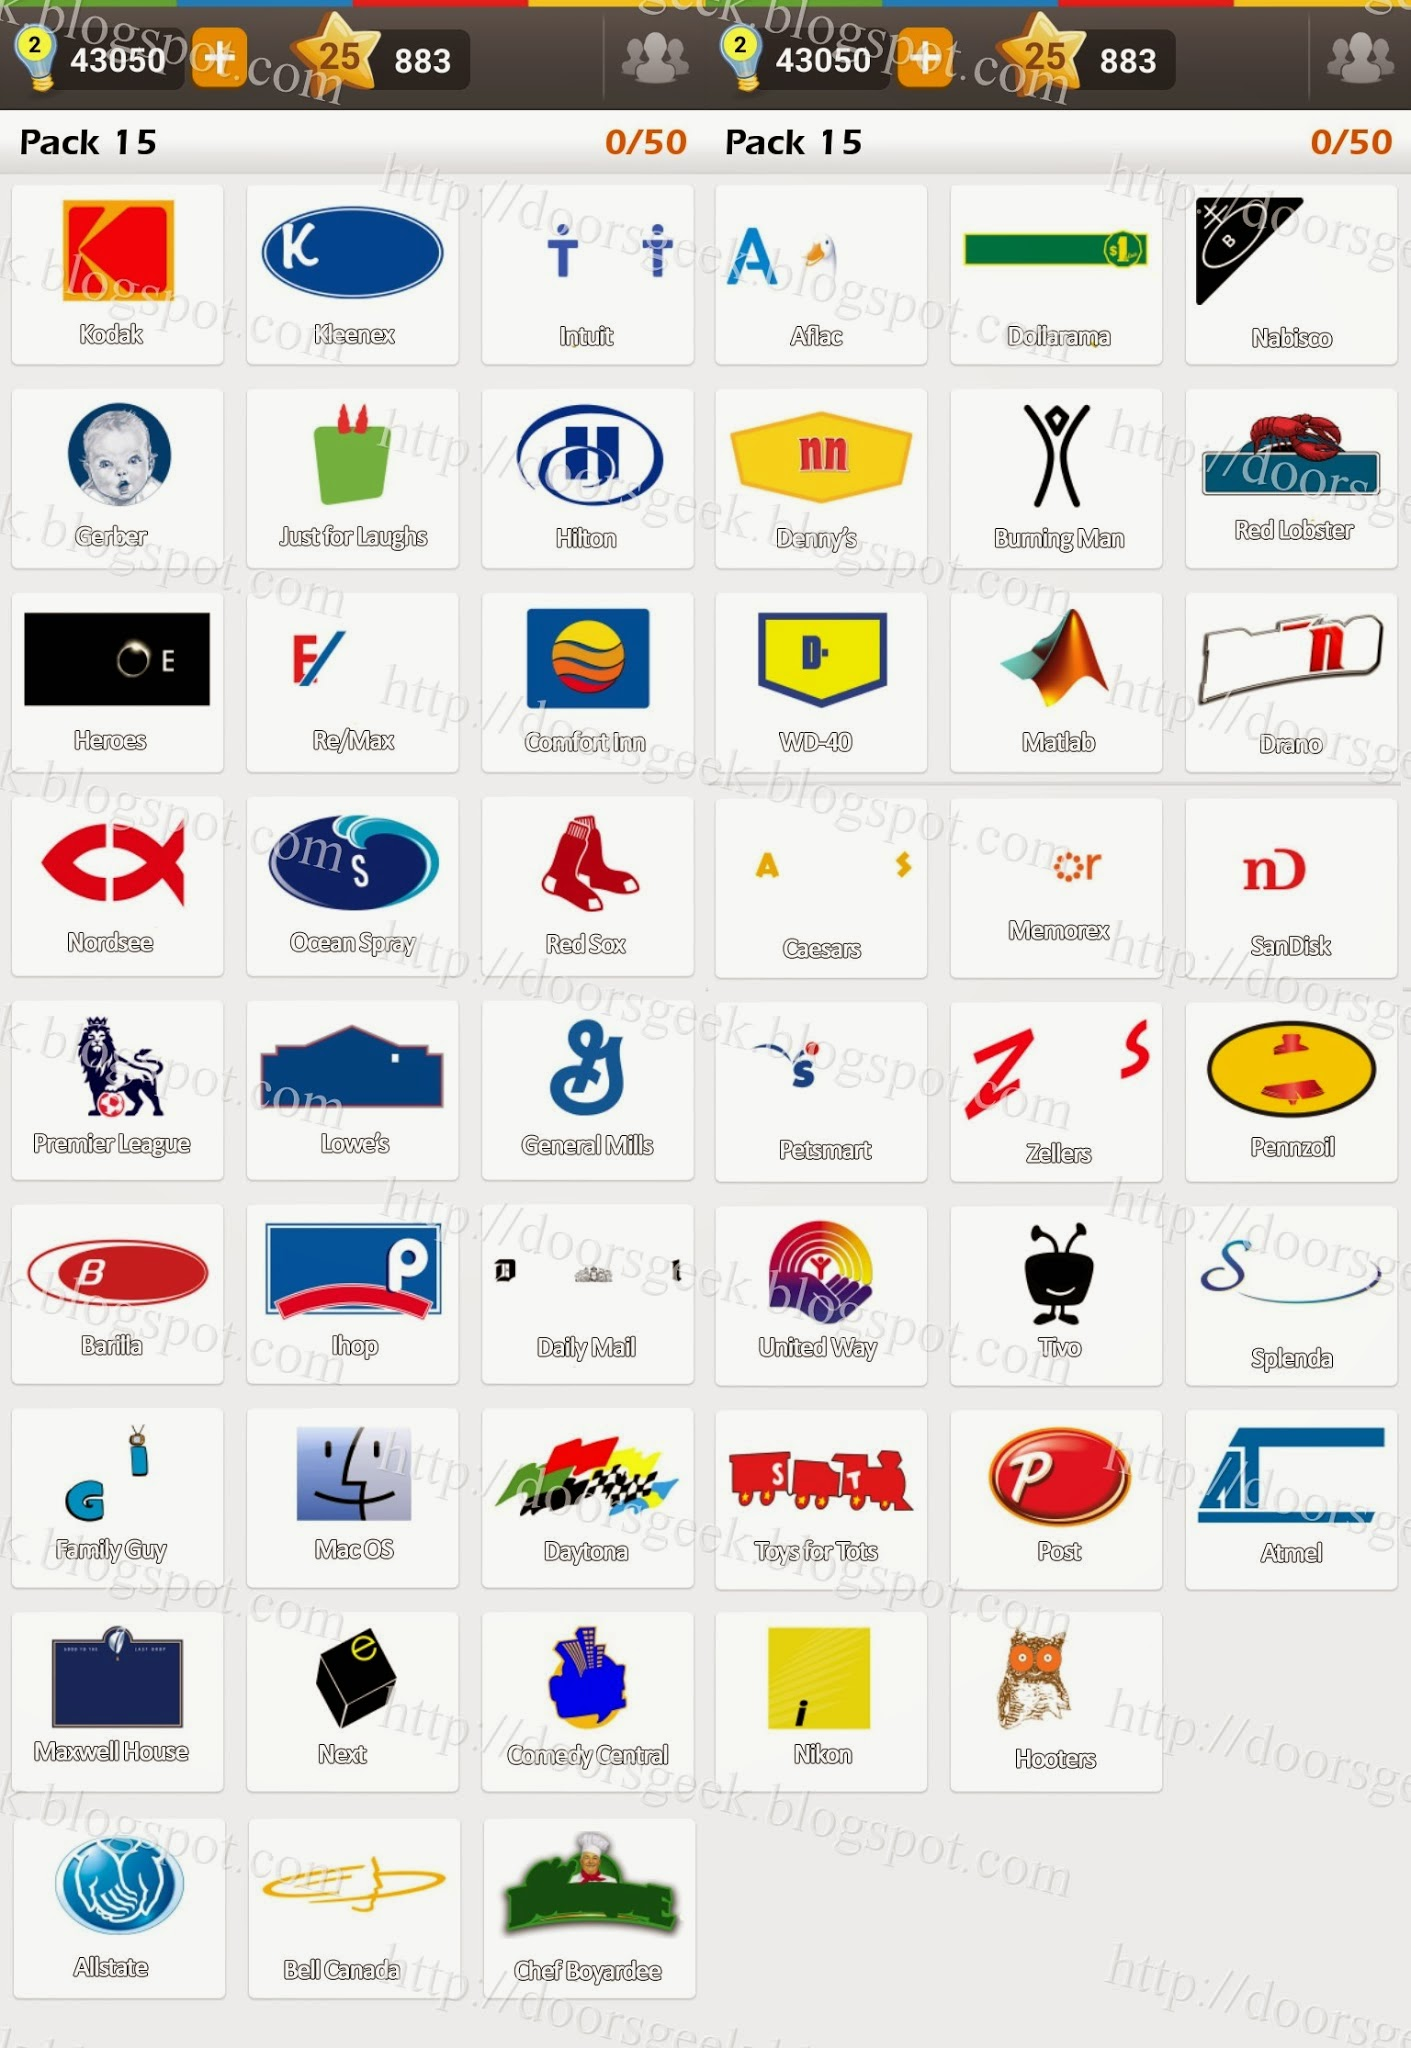 logo game guess the brand regular pack 15 doors geek